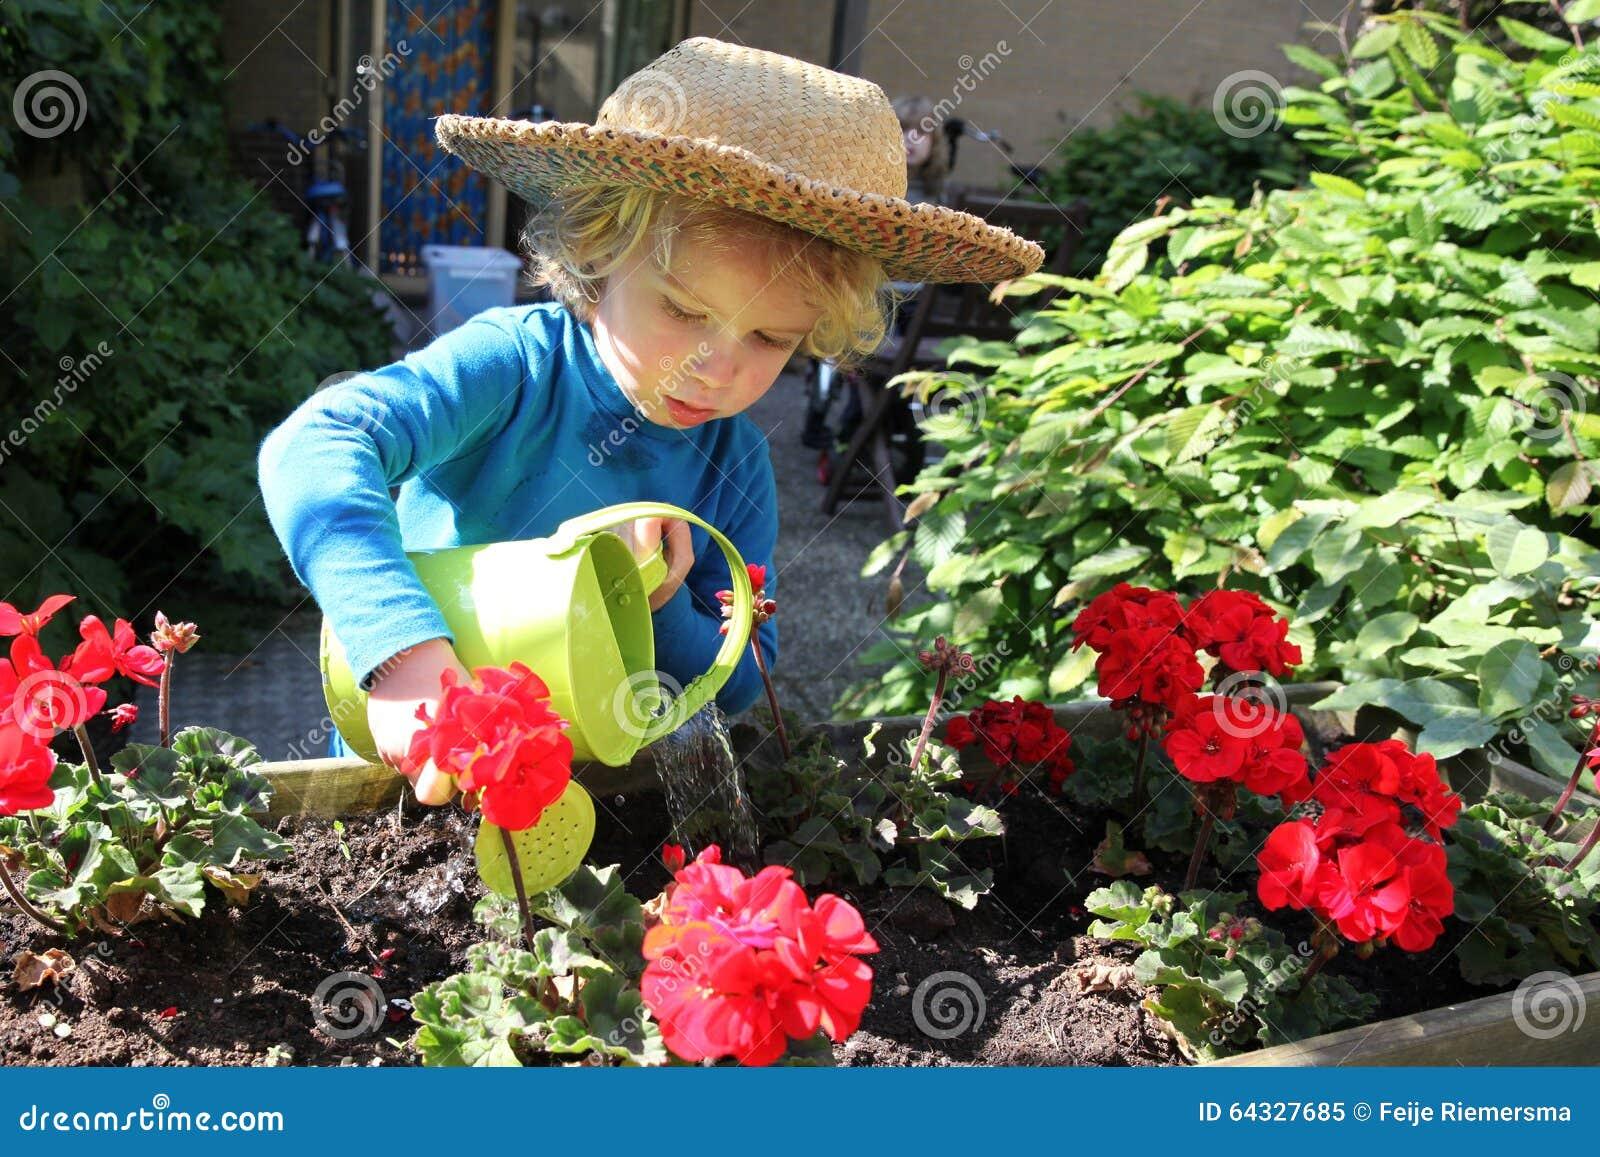 Young child watering flowers garden boy spring 64327685 jpg